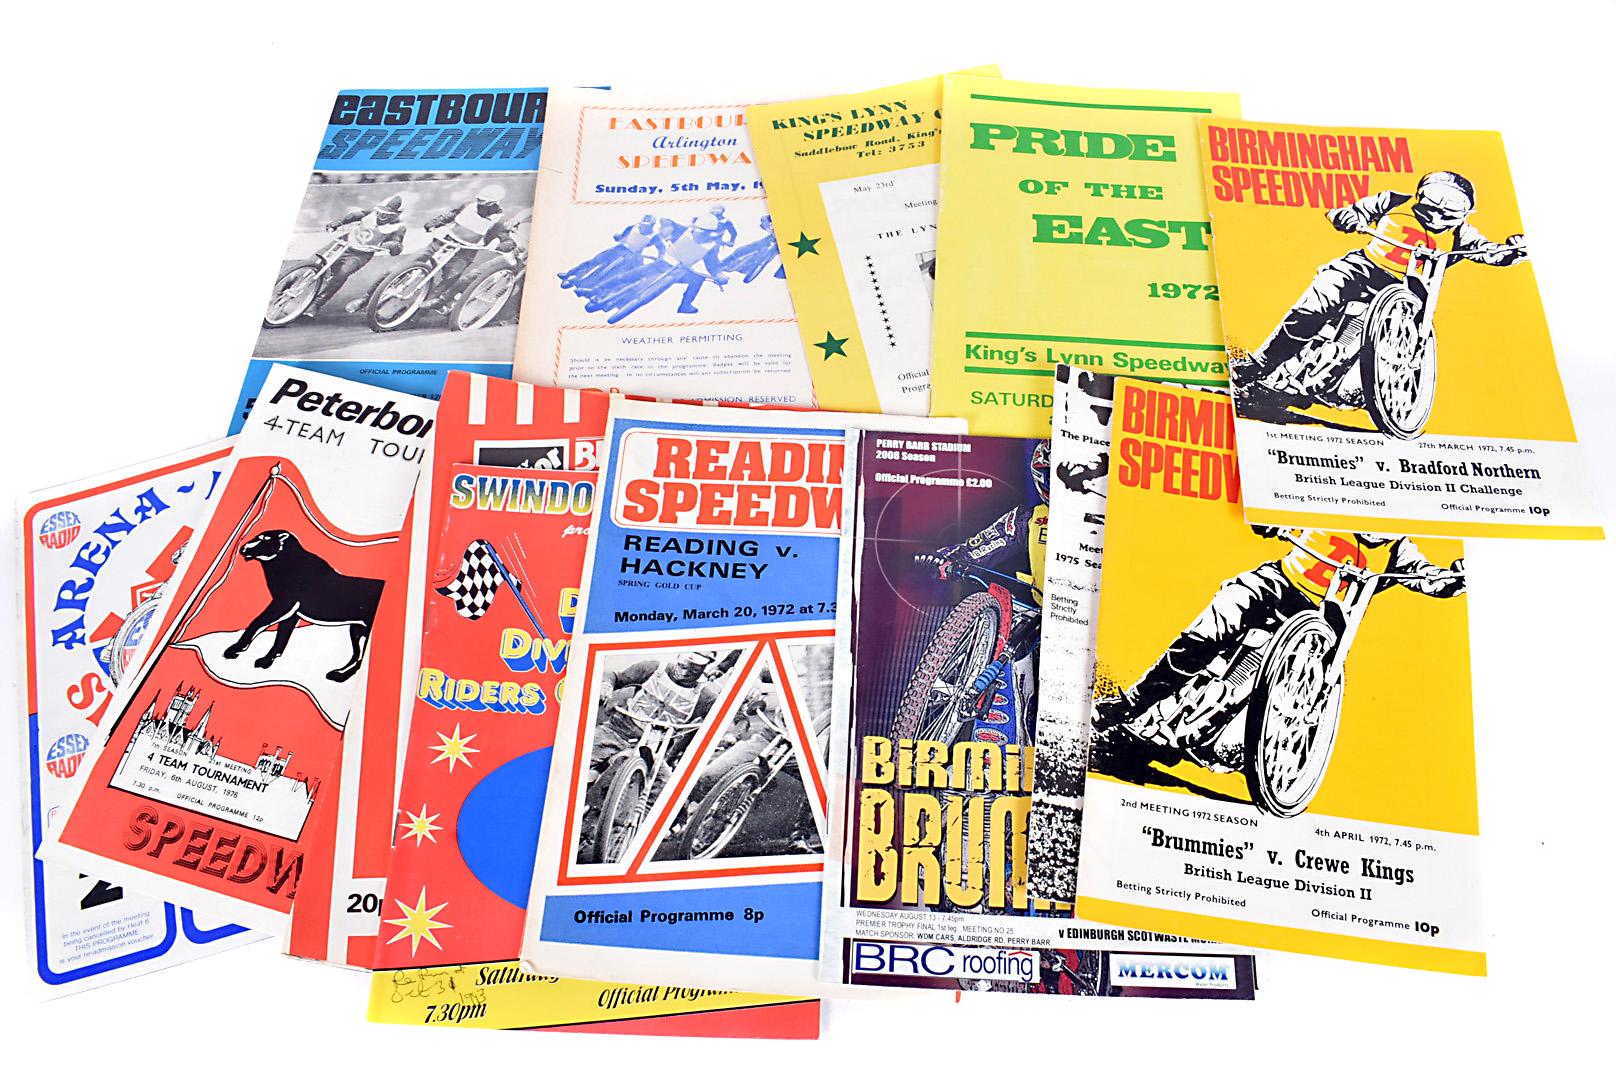 Speedway Programmes, well over one thousand programmes for Birmingham (400) Cradley Heath (150)